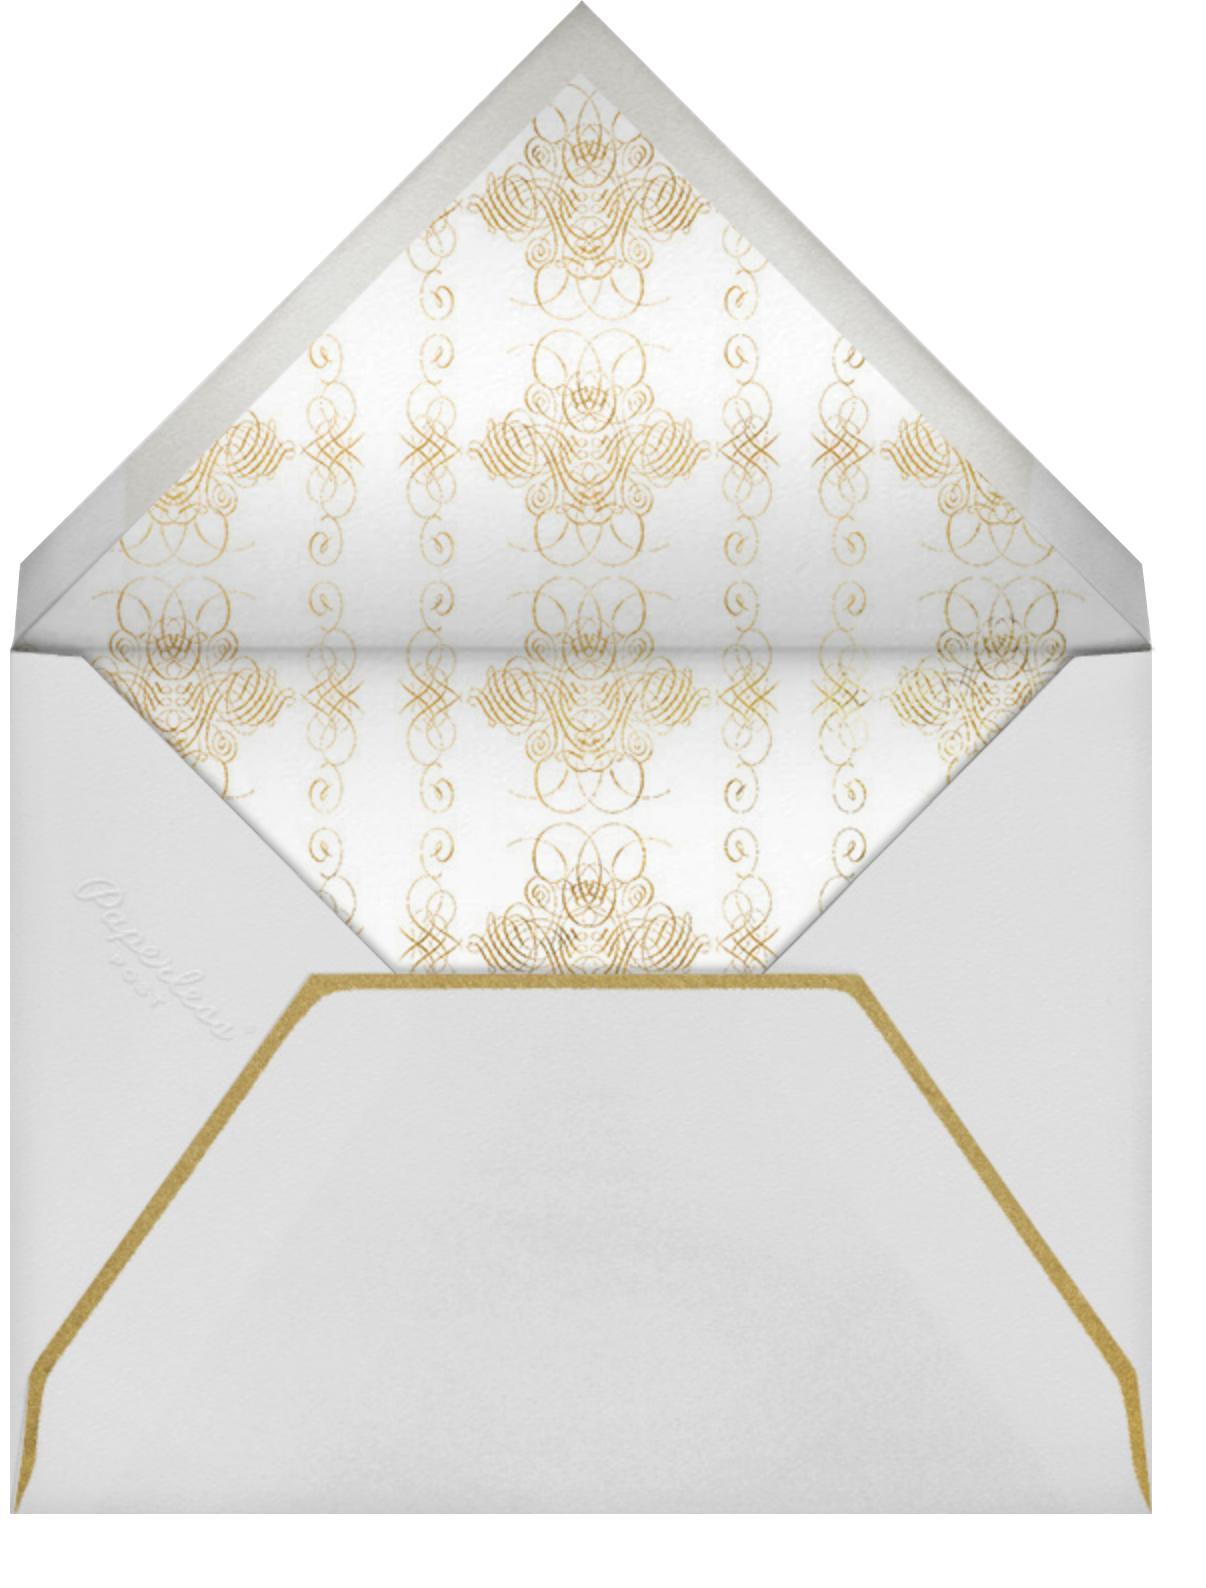 Crux (Invitation) - Gold - Bernard Maisner - Envelope